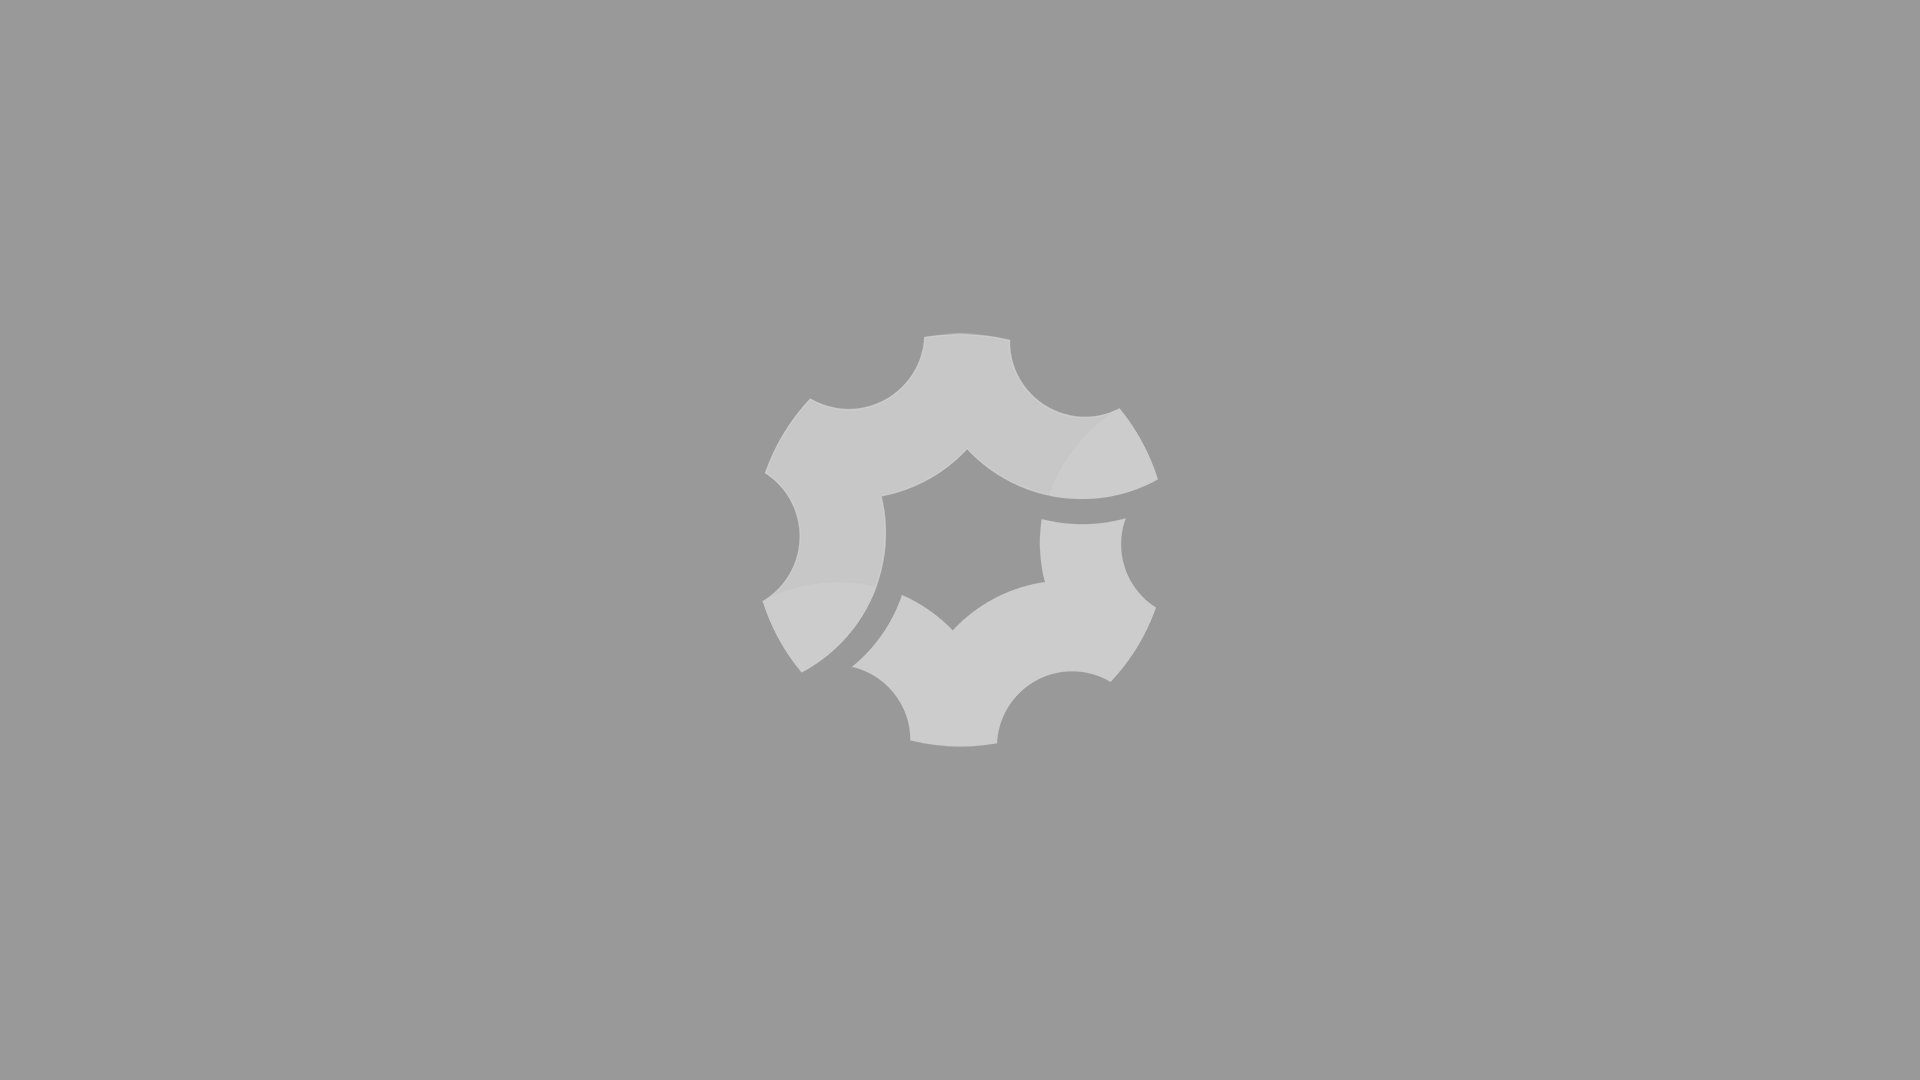 new_bitmap_image_3.bmp_thumb.png